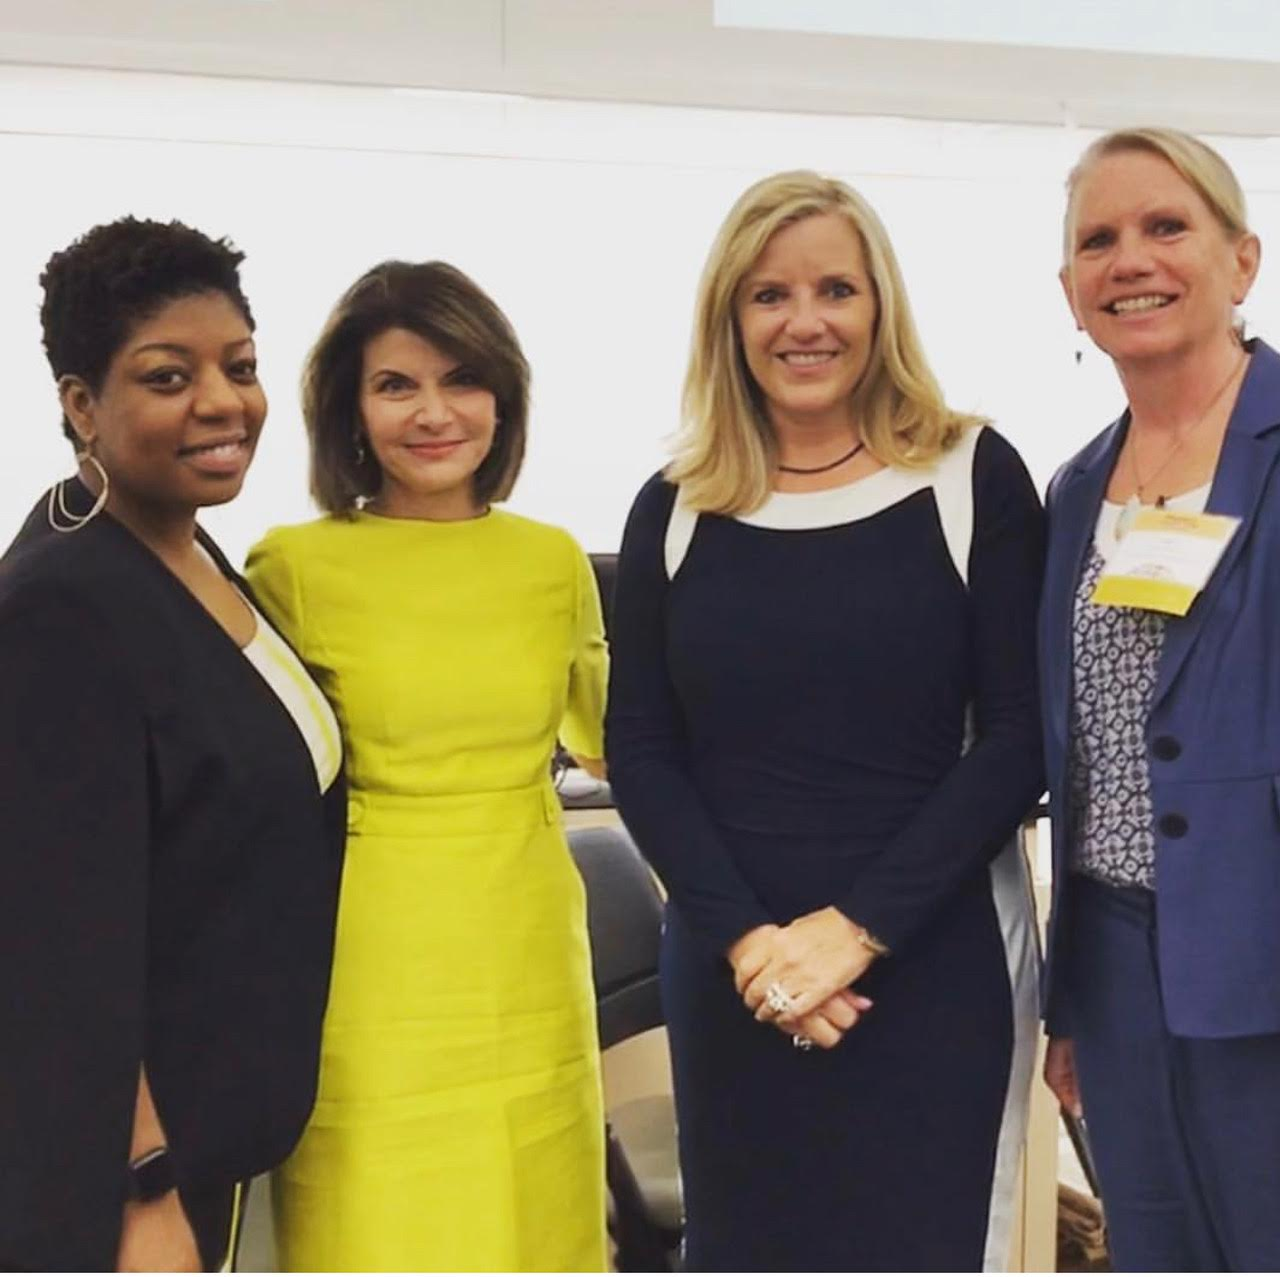 Seena Hodges, Archelle Georgiou, MD, Sheri Lewis, and Lori Reese Earley